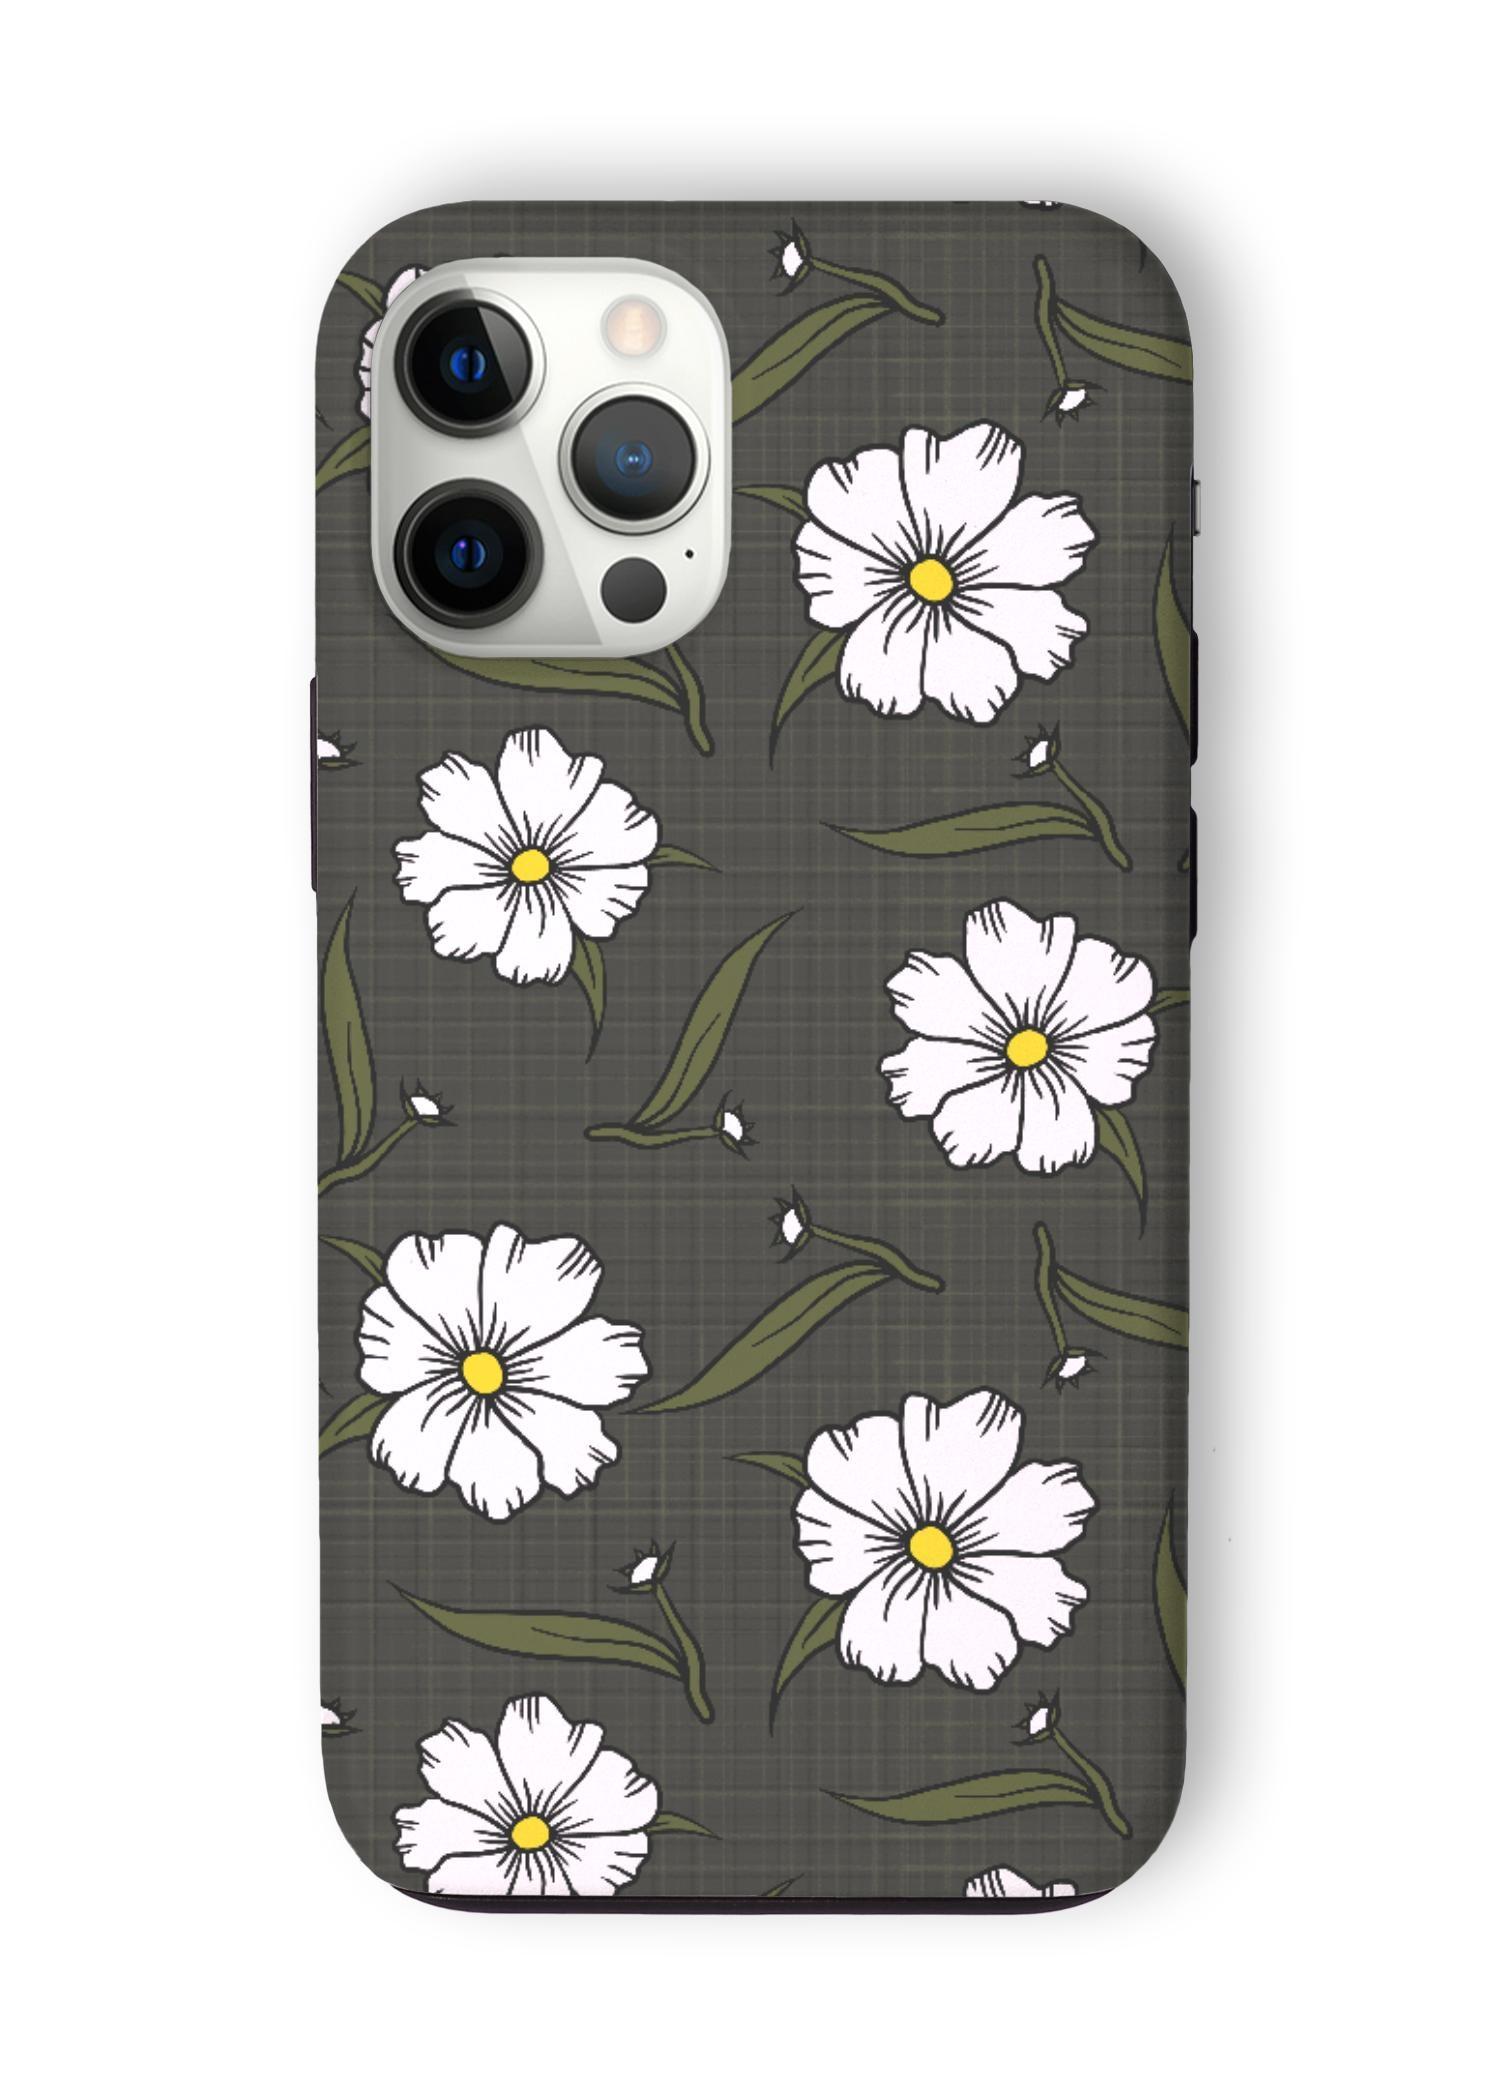 VIDA iPhone Case - Lovely Garden in White by VIDA Original Artist  - Size: iPhone 12 Pro Max / Tough